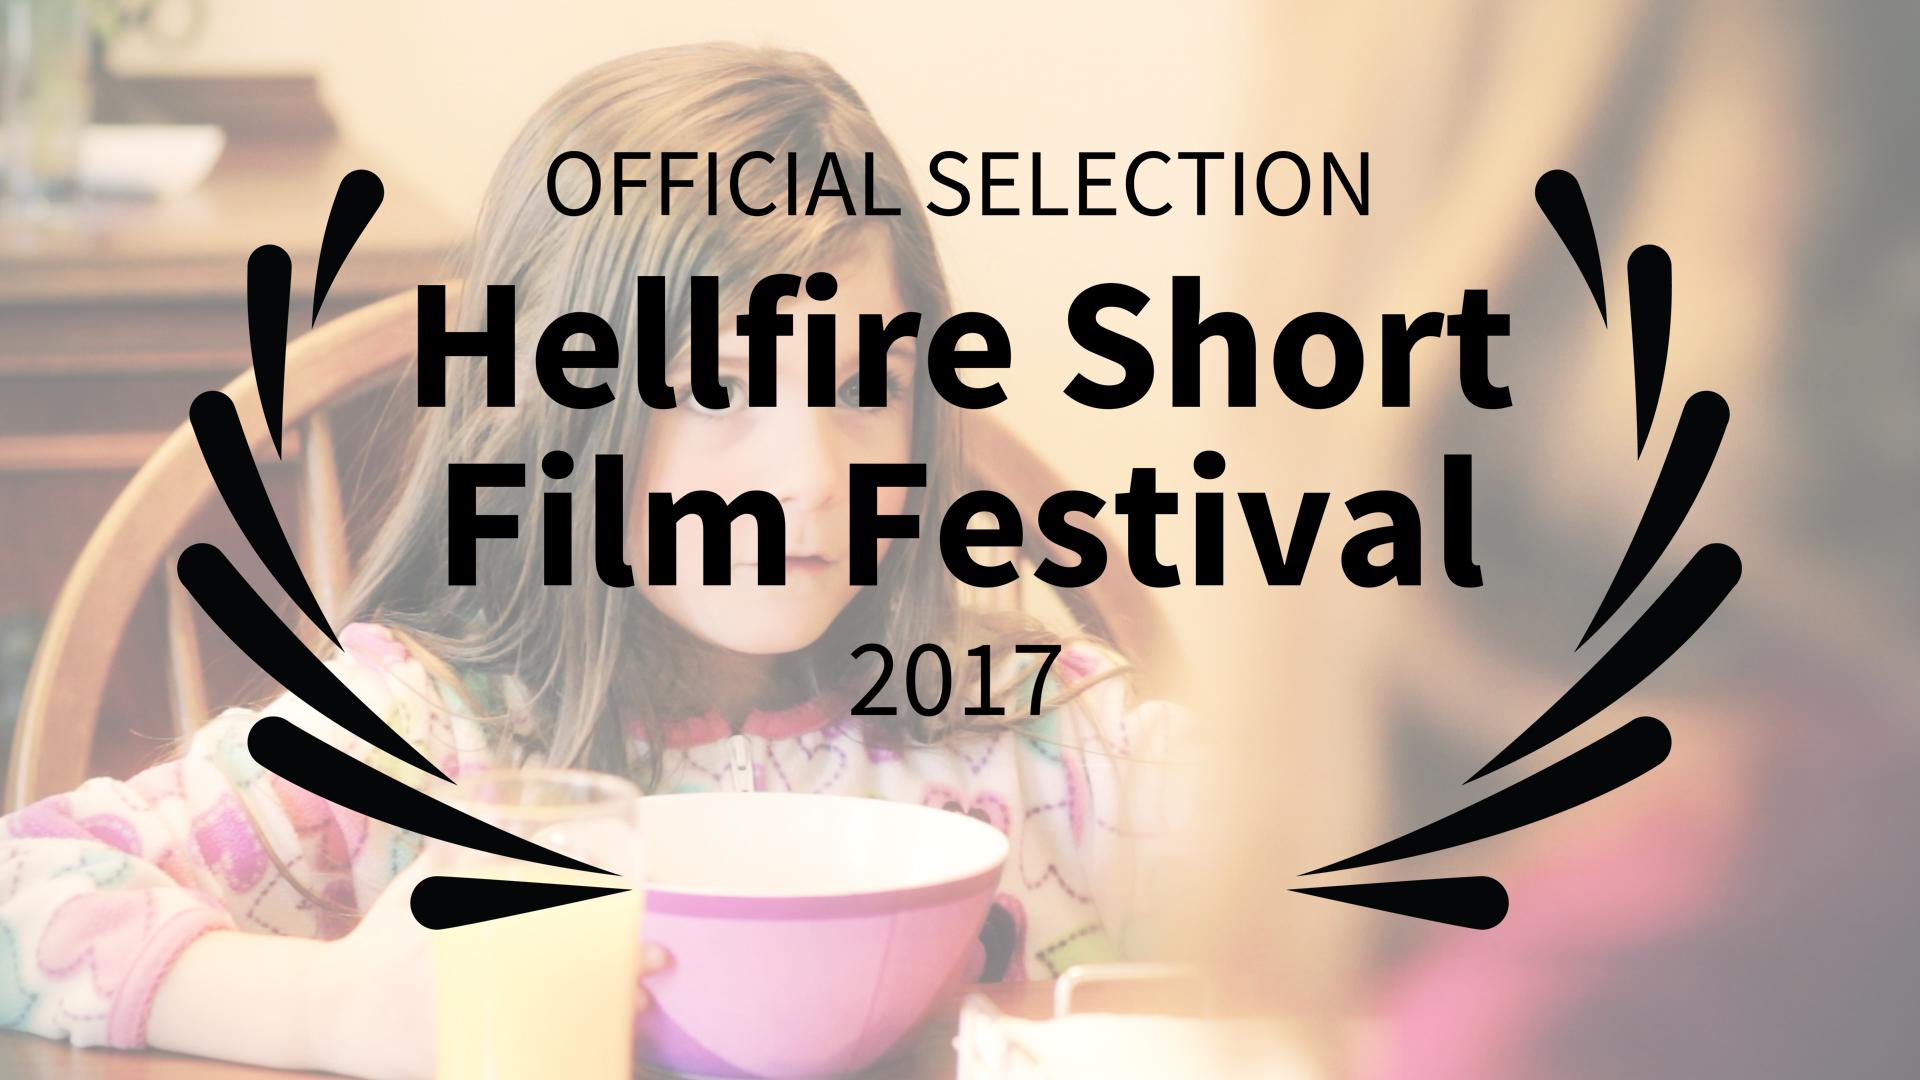 Geena Matuson's 'Ice Cream for Breakfast' Official Selection for Hellfire Short Film Festival 2017 #thegirlmirage @geenamatuson